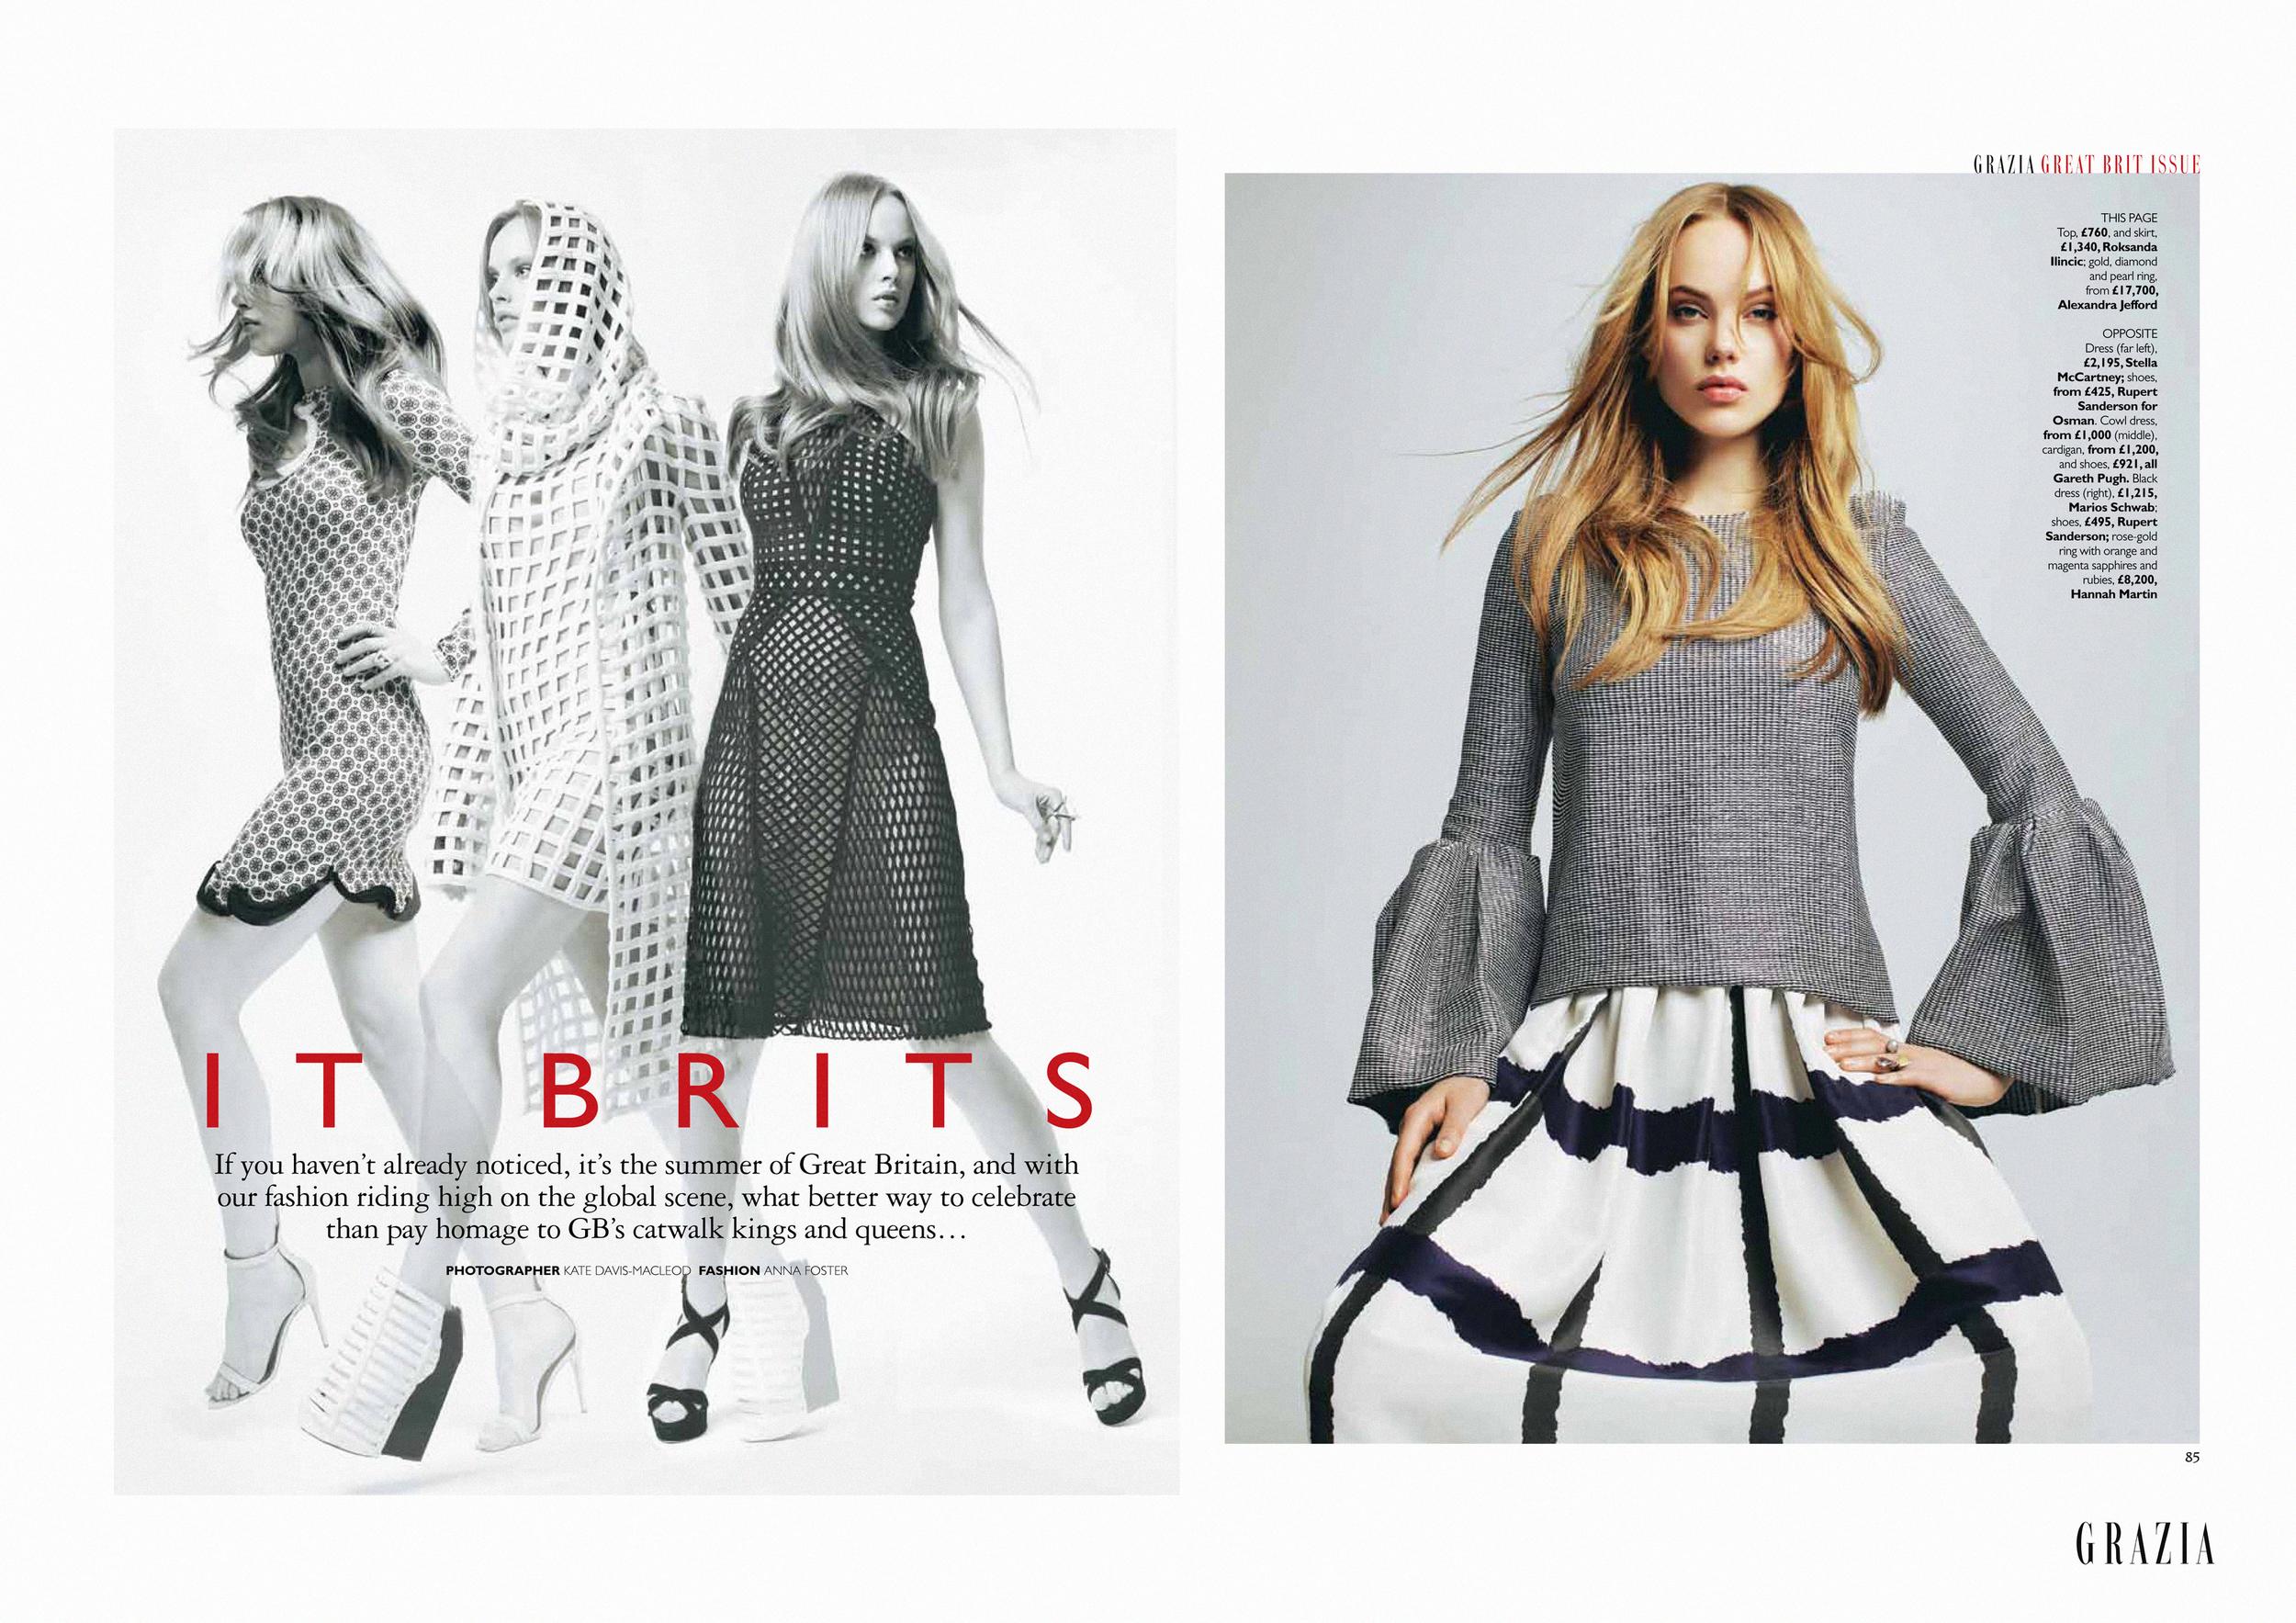 brits.jpg